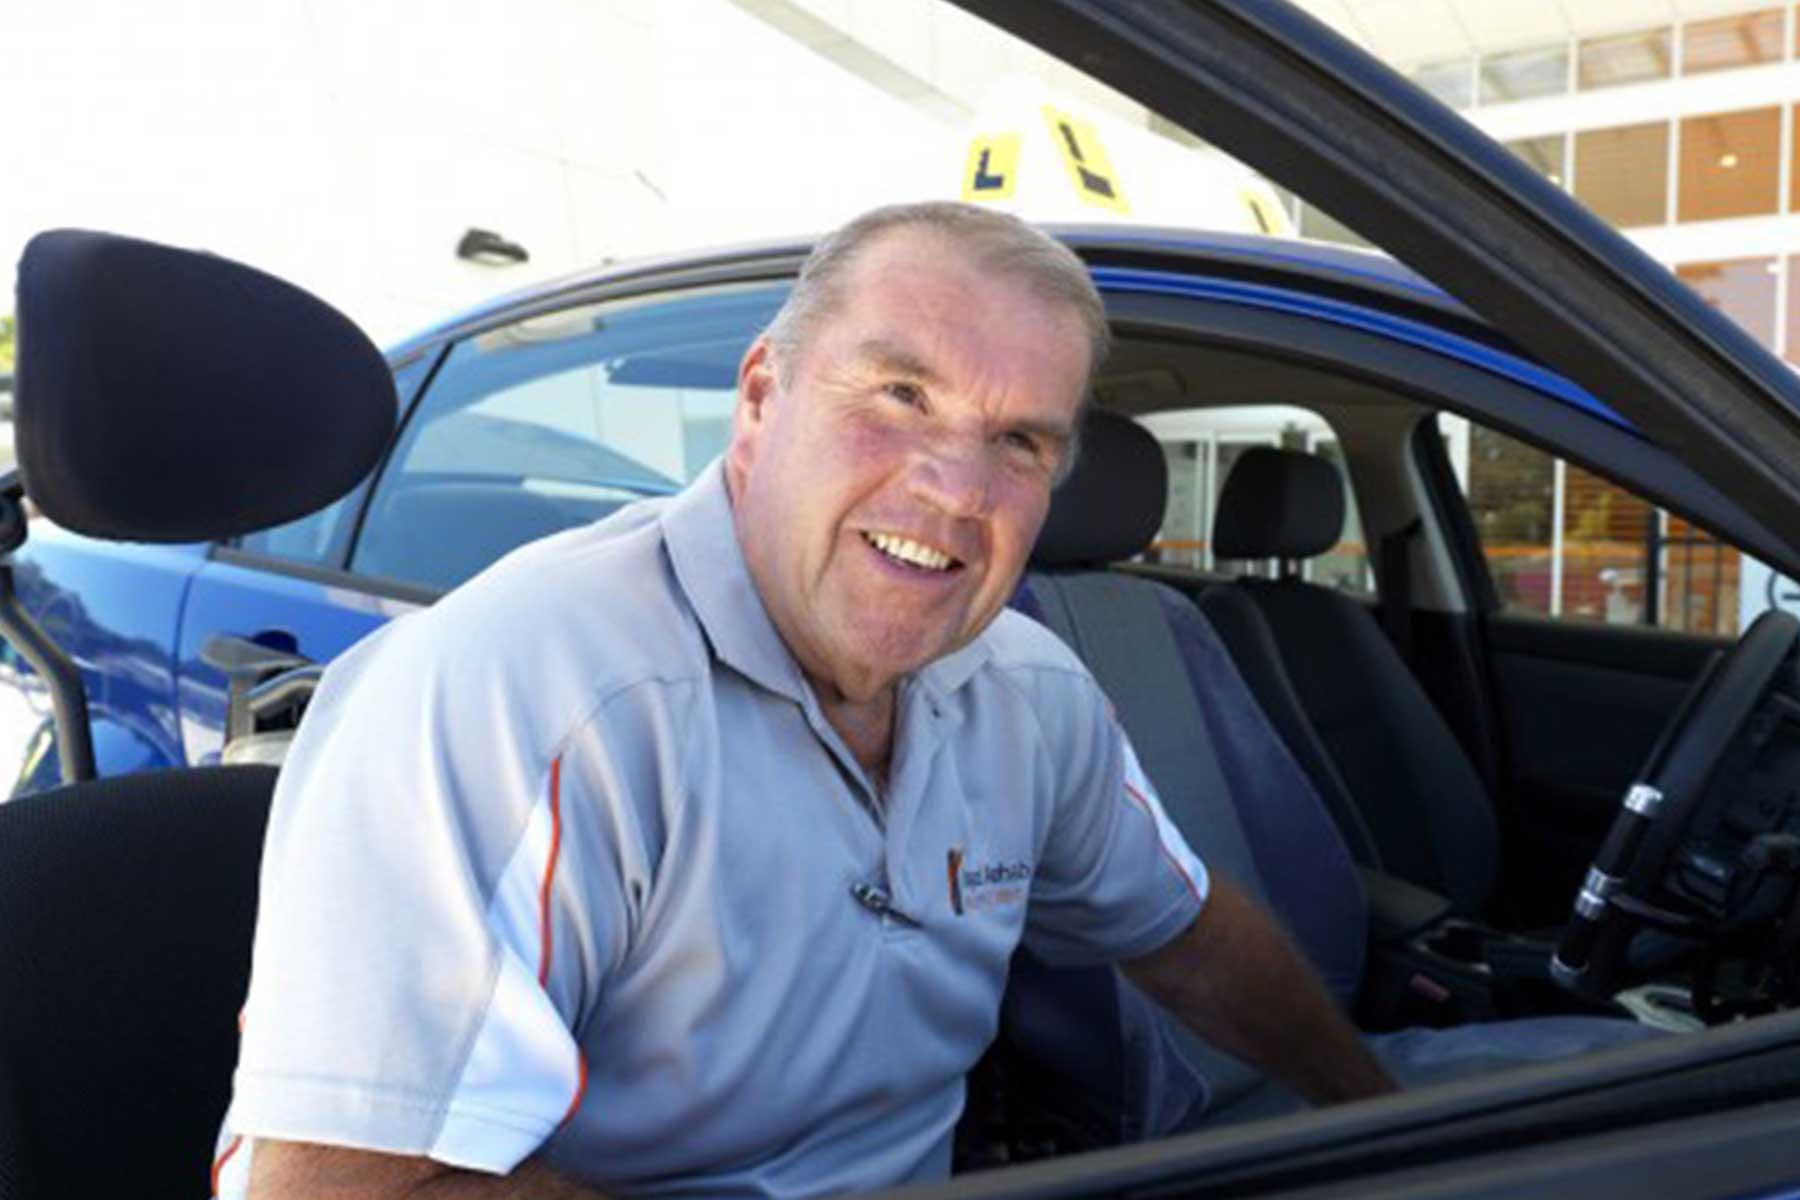 Graeme-driver-assessment